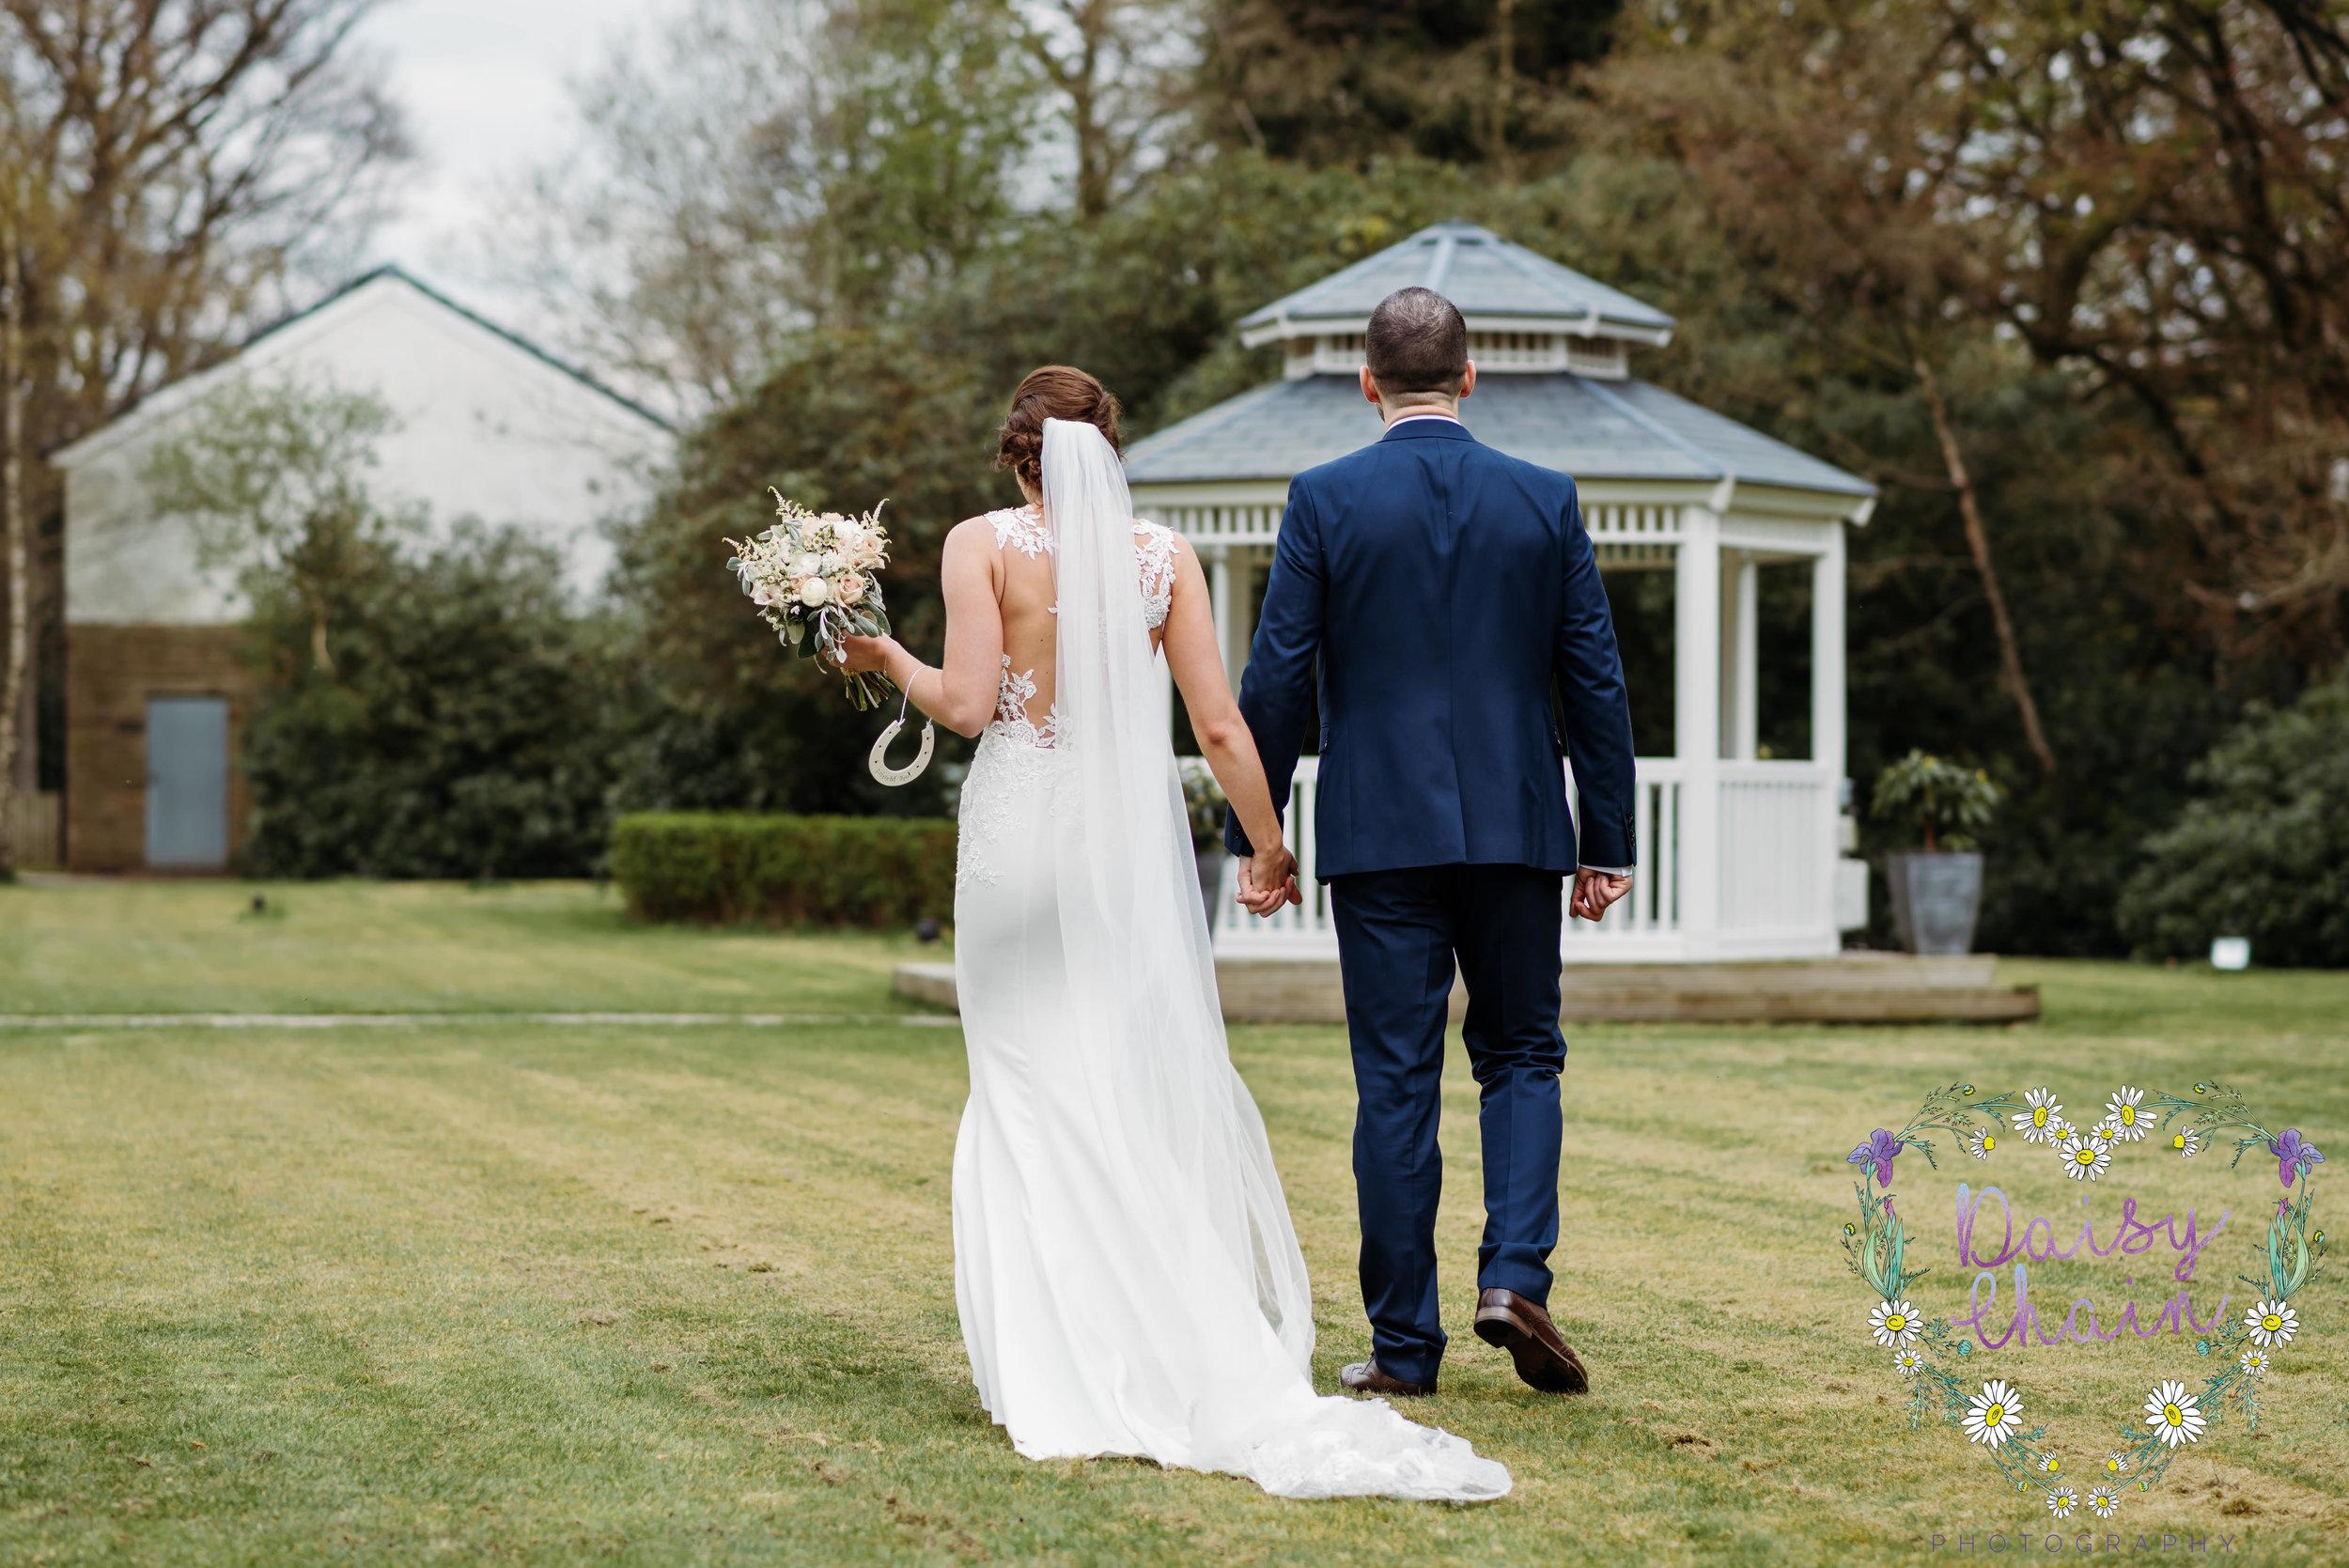 bride and groom lancashire